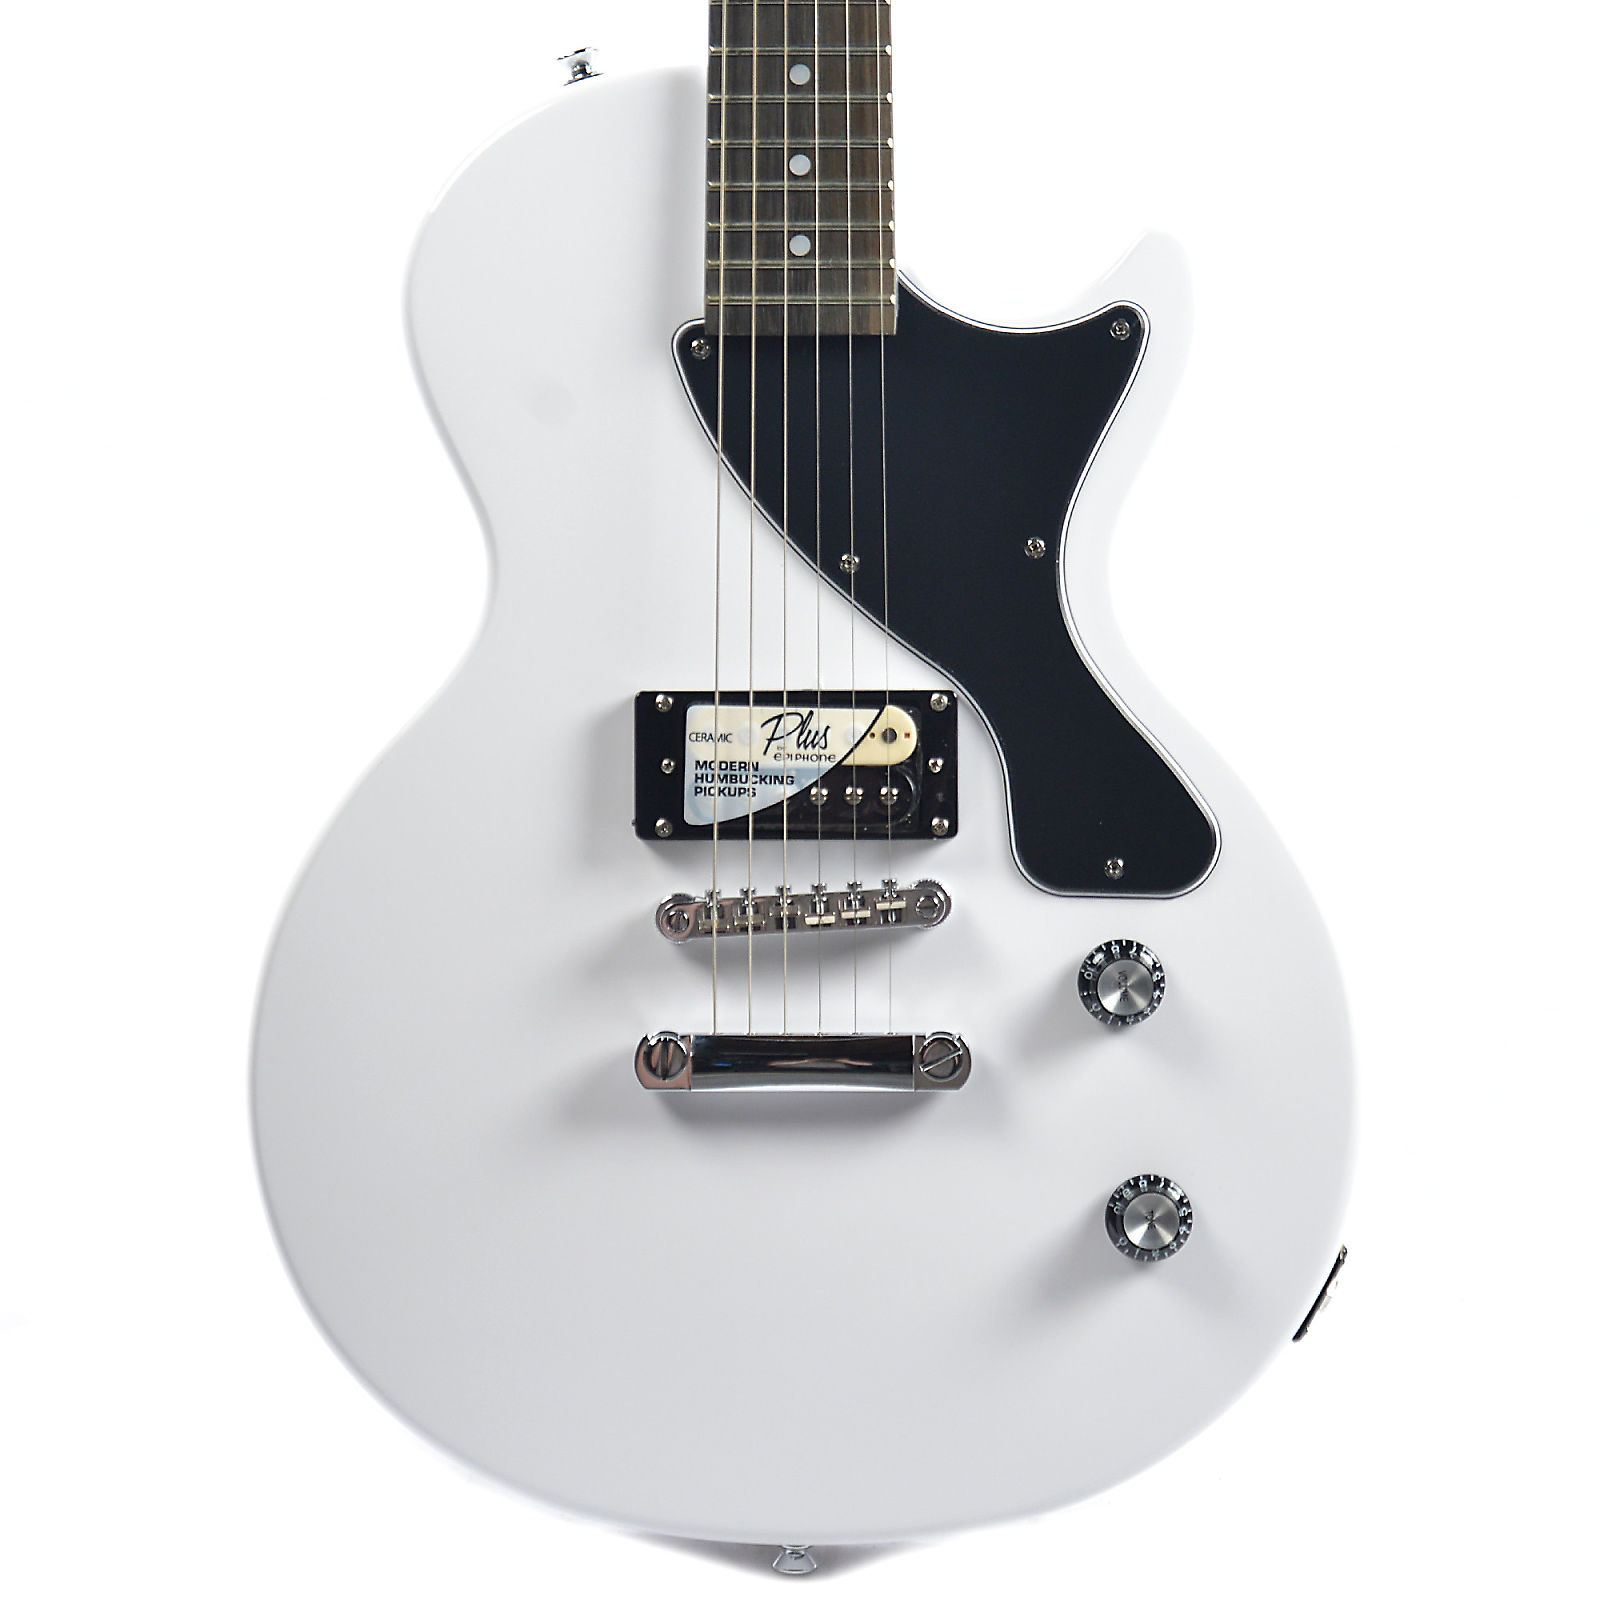 Epiphone PRO-1 Les Paul Jr  Electric Guitar Pack Alpine White w/MityPRO  Mini-Amplifier